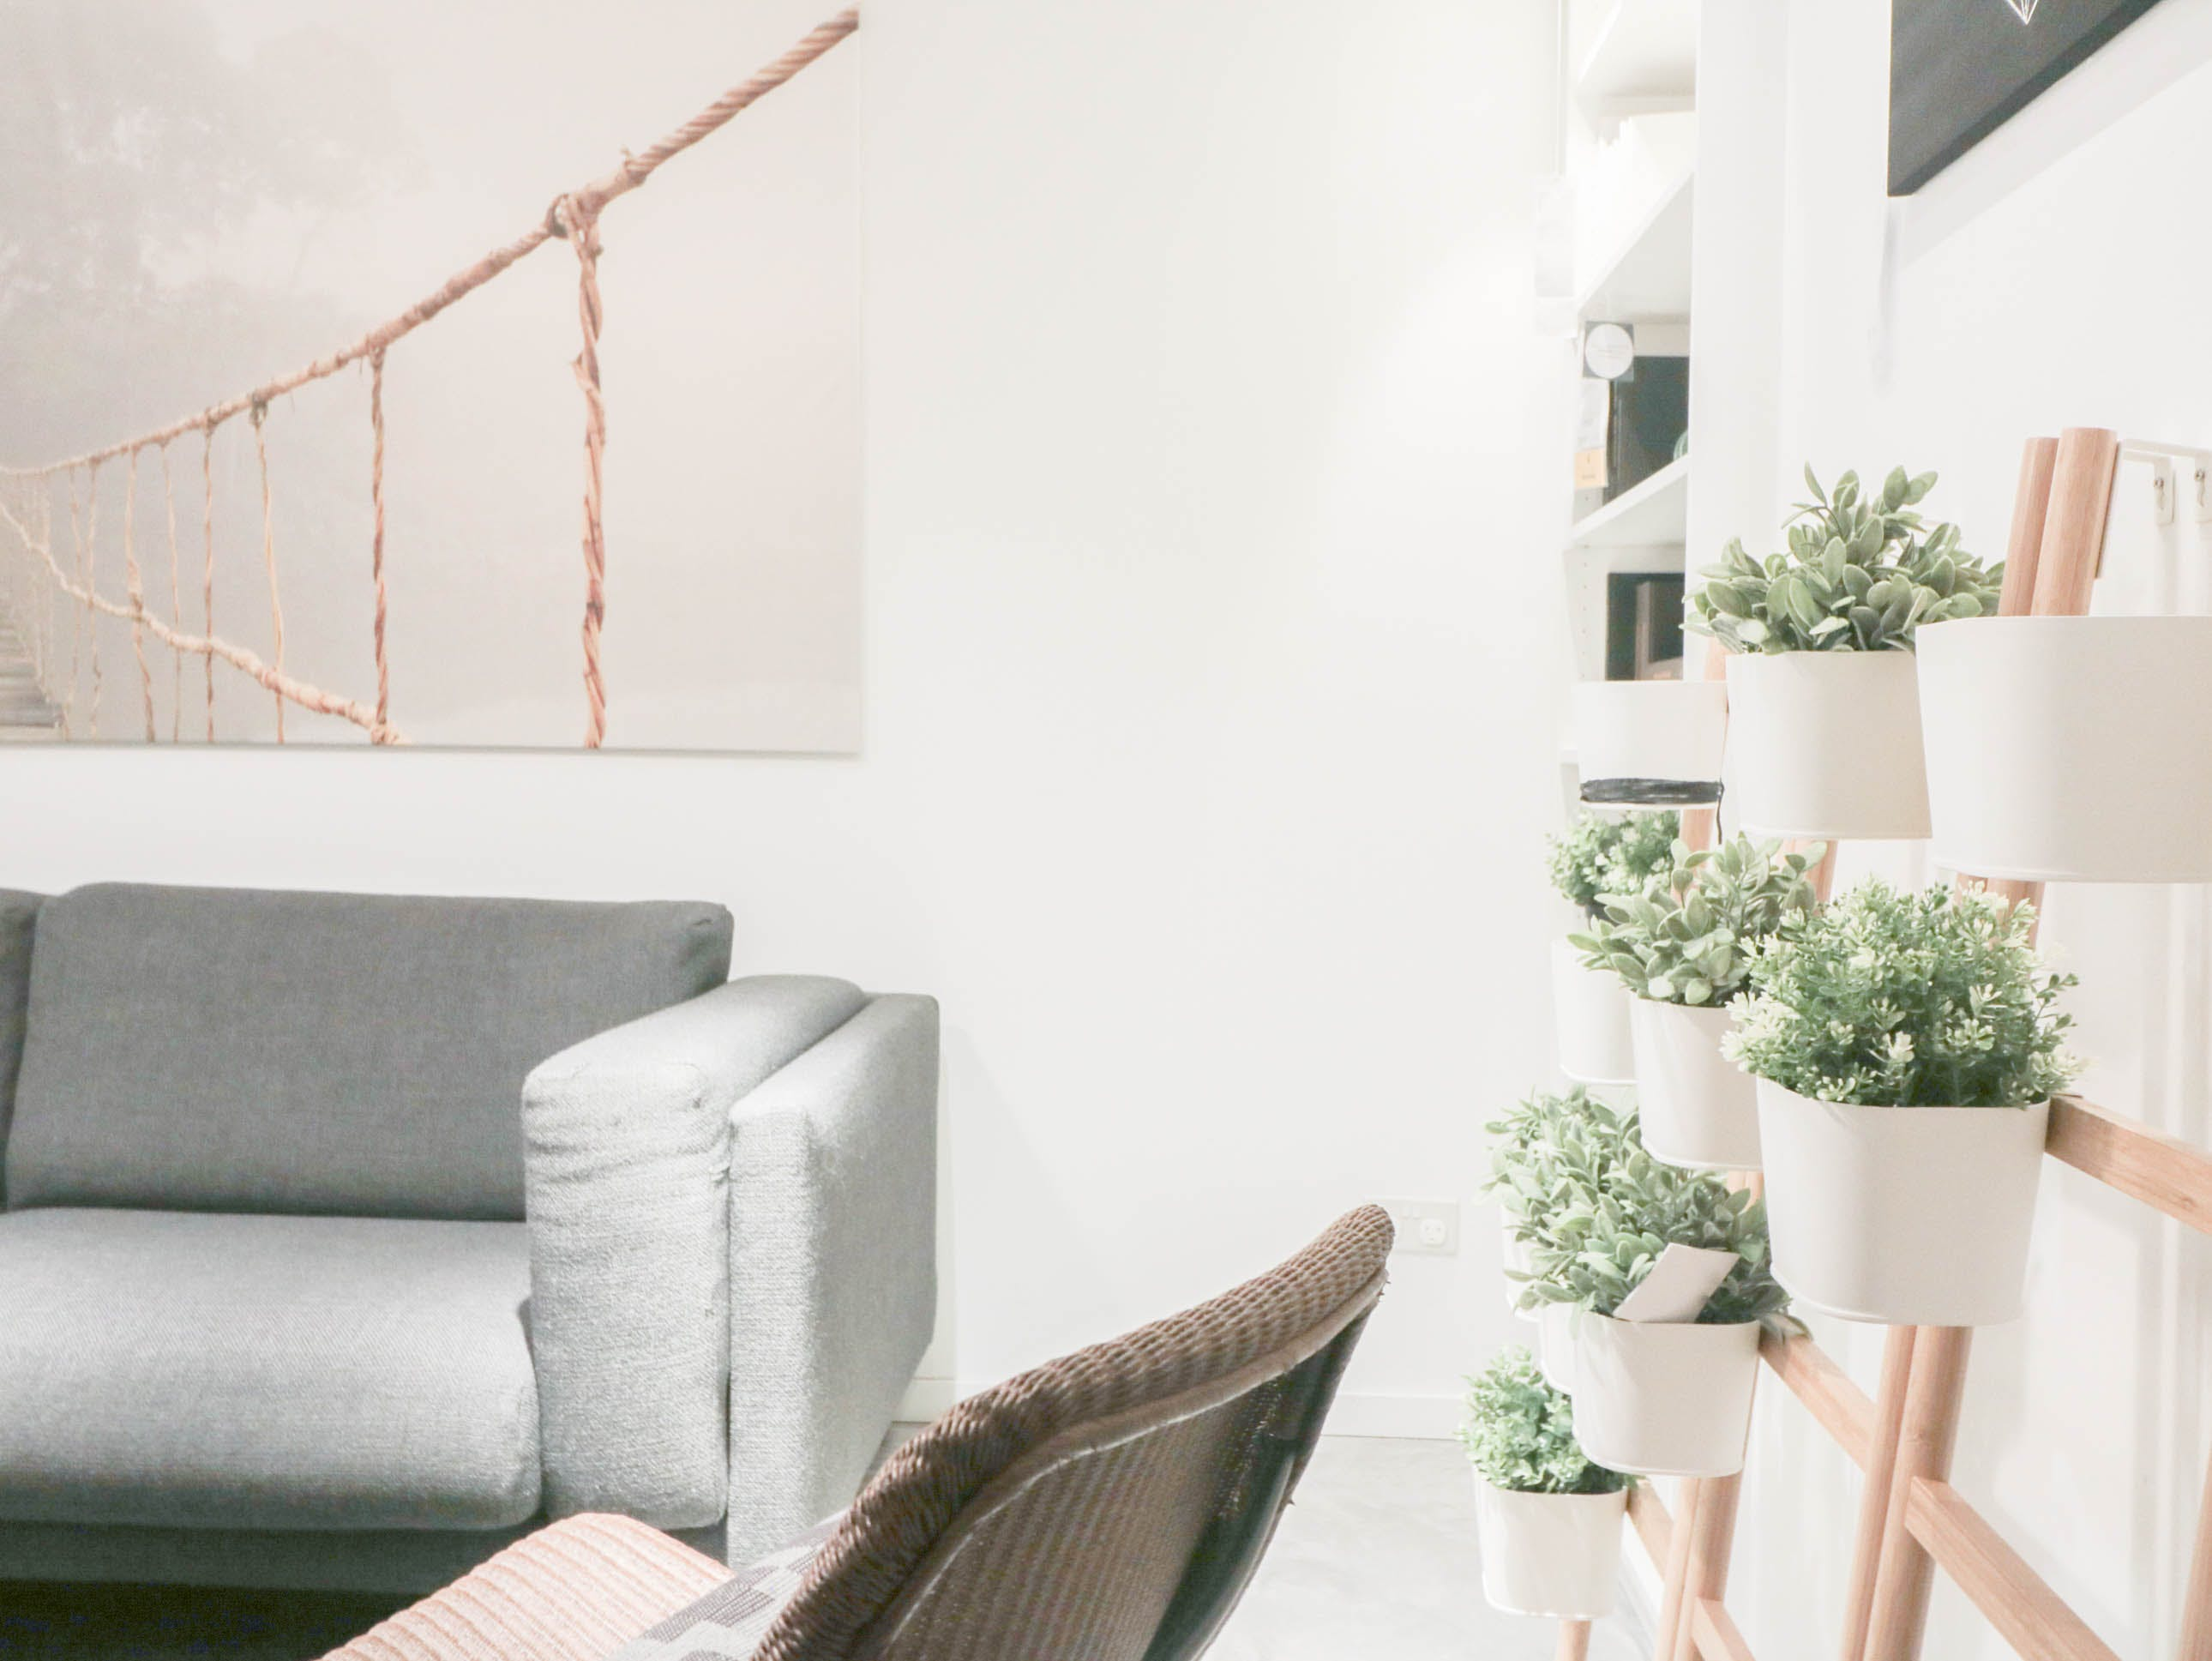 Free stock photo of plants, home, interior, scandinavia